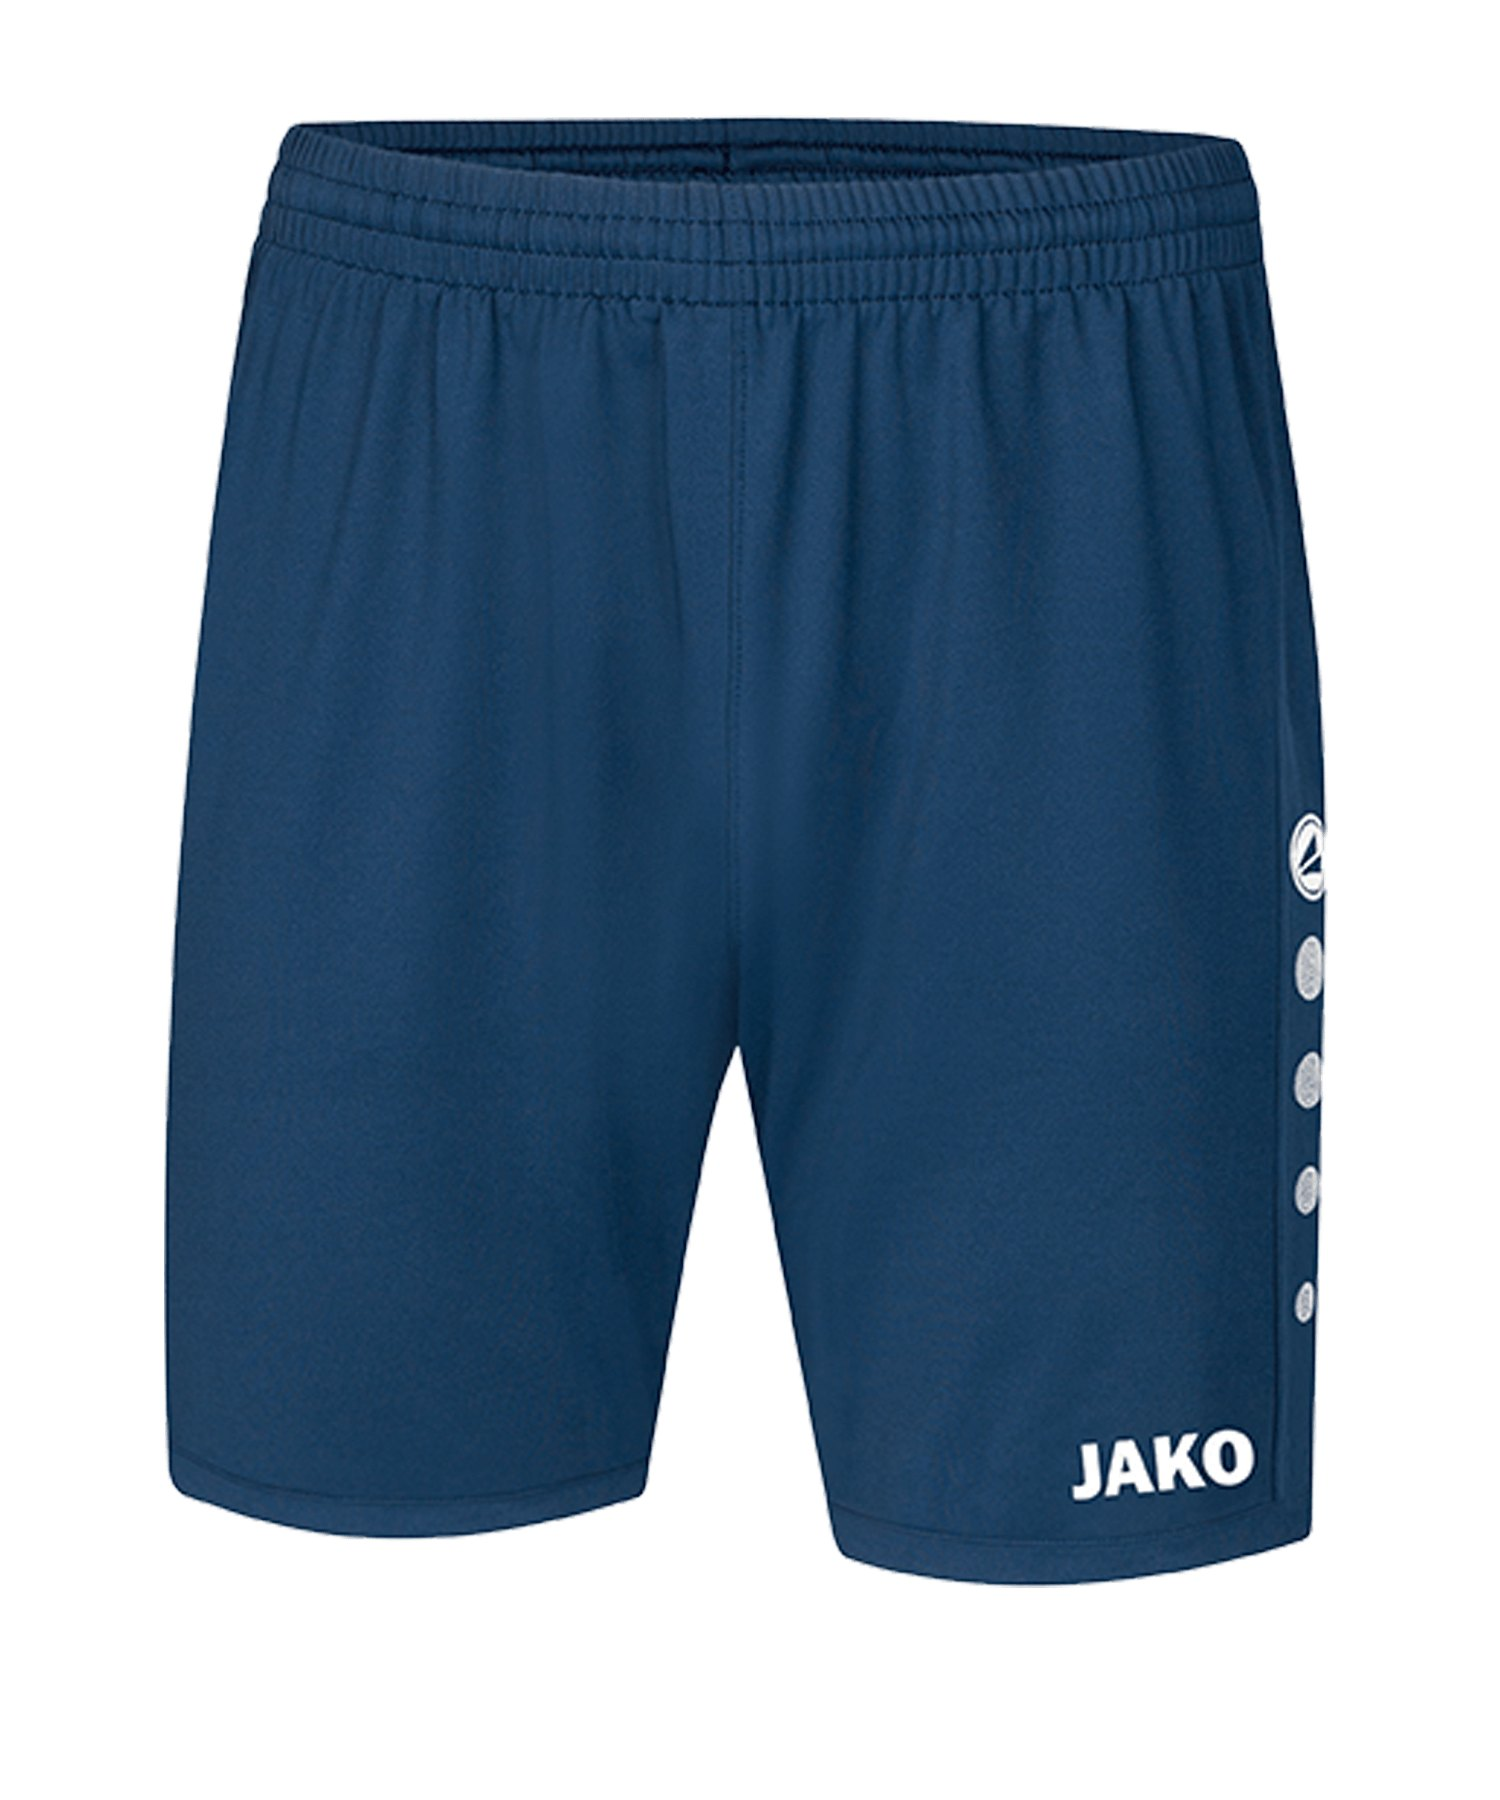 JAKO Premium Short Blau F09 - blau